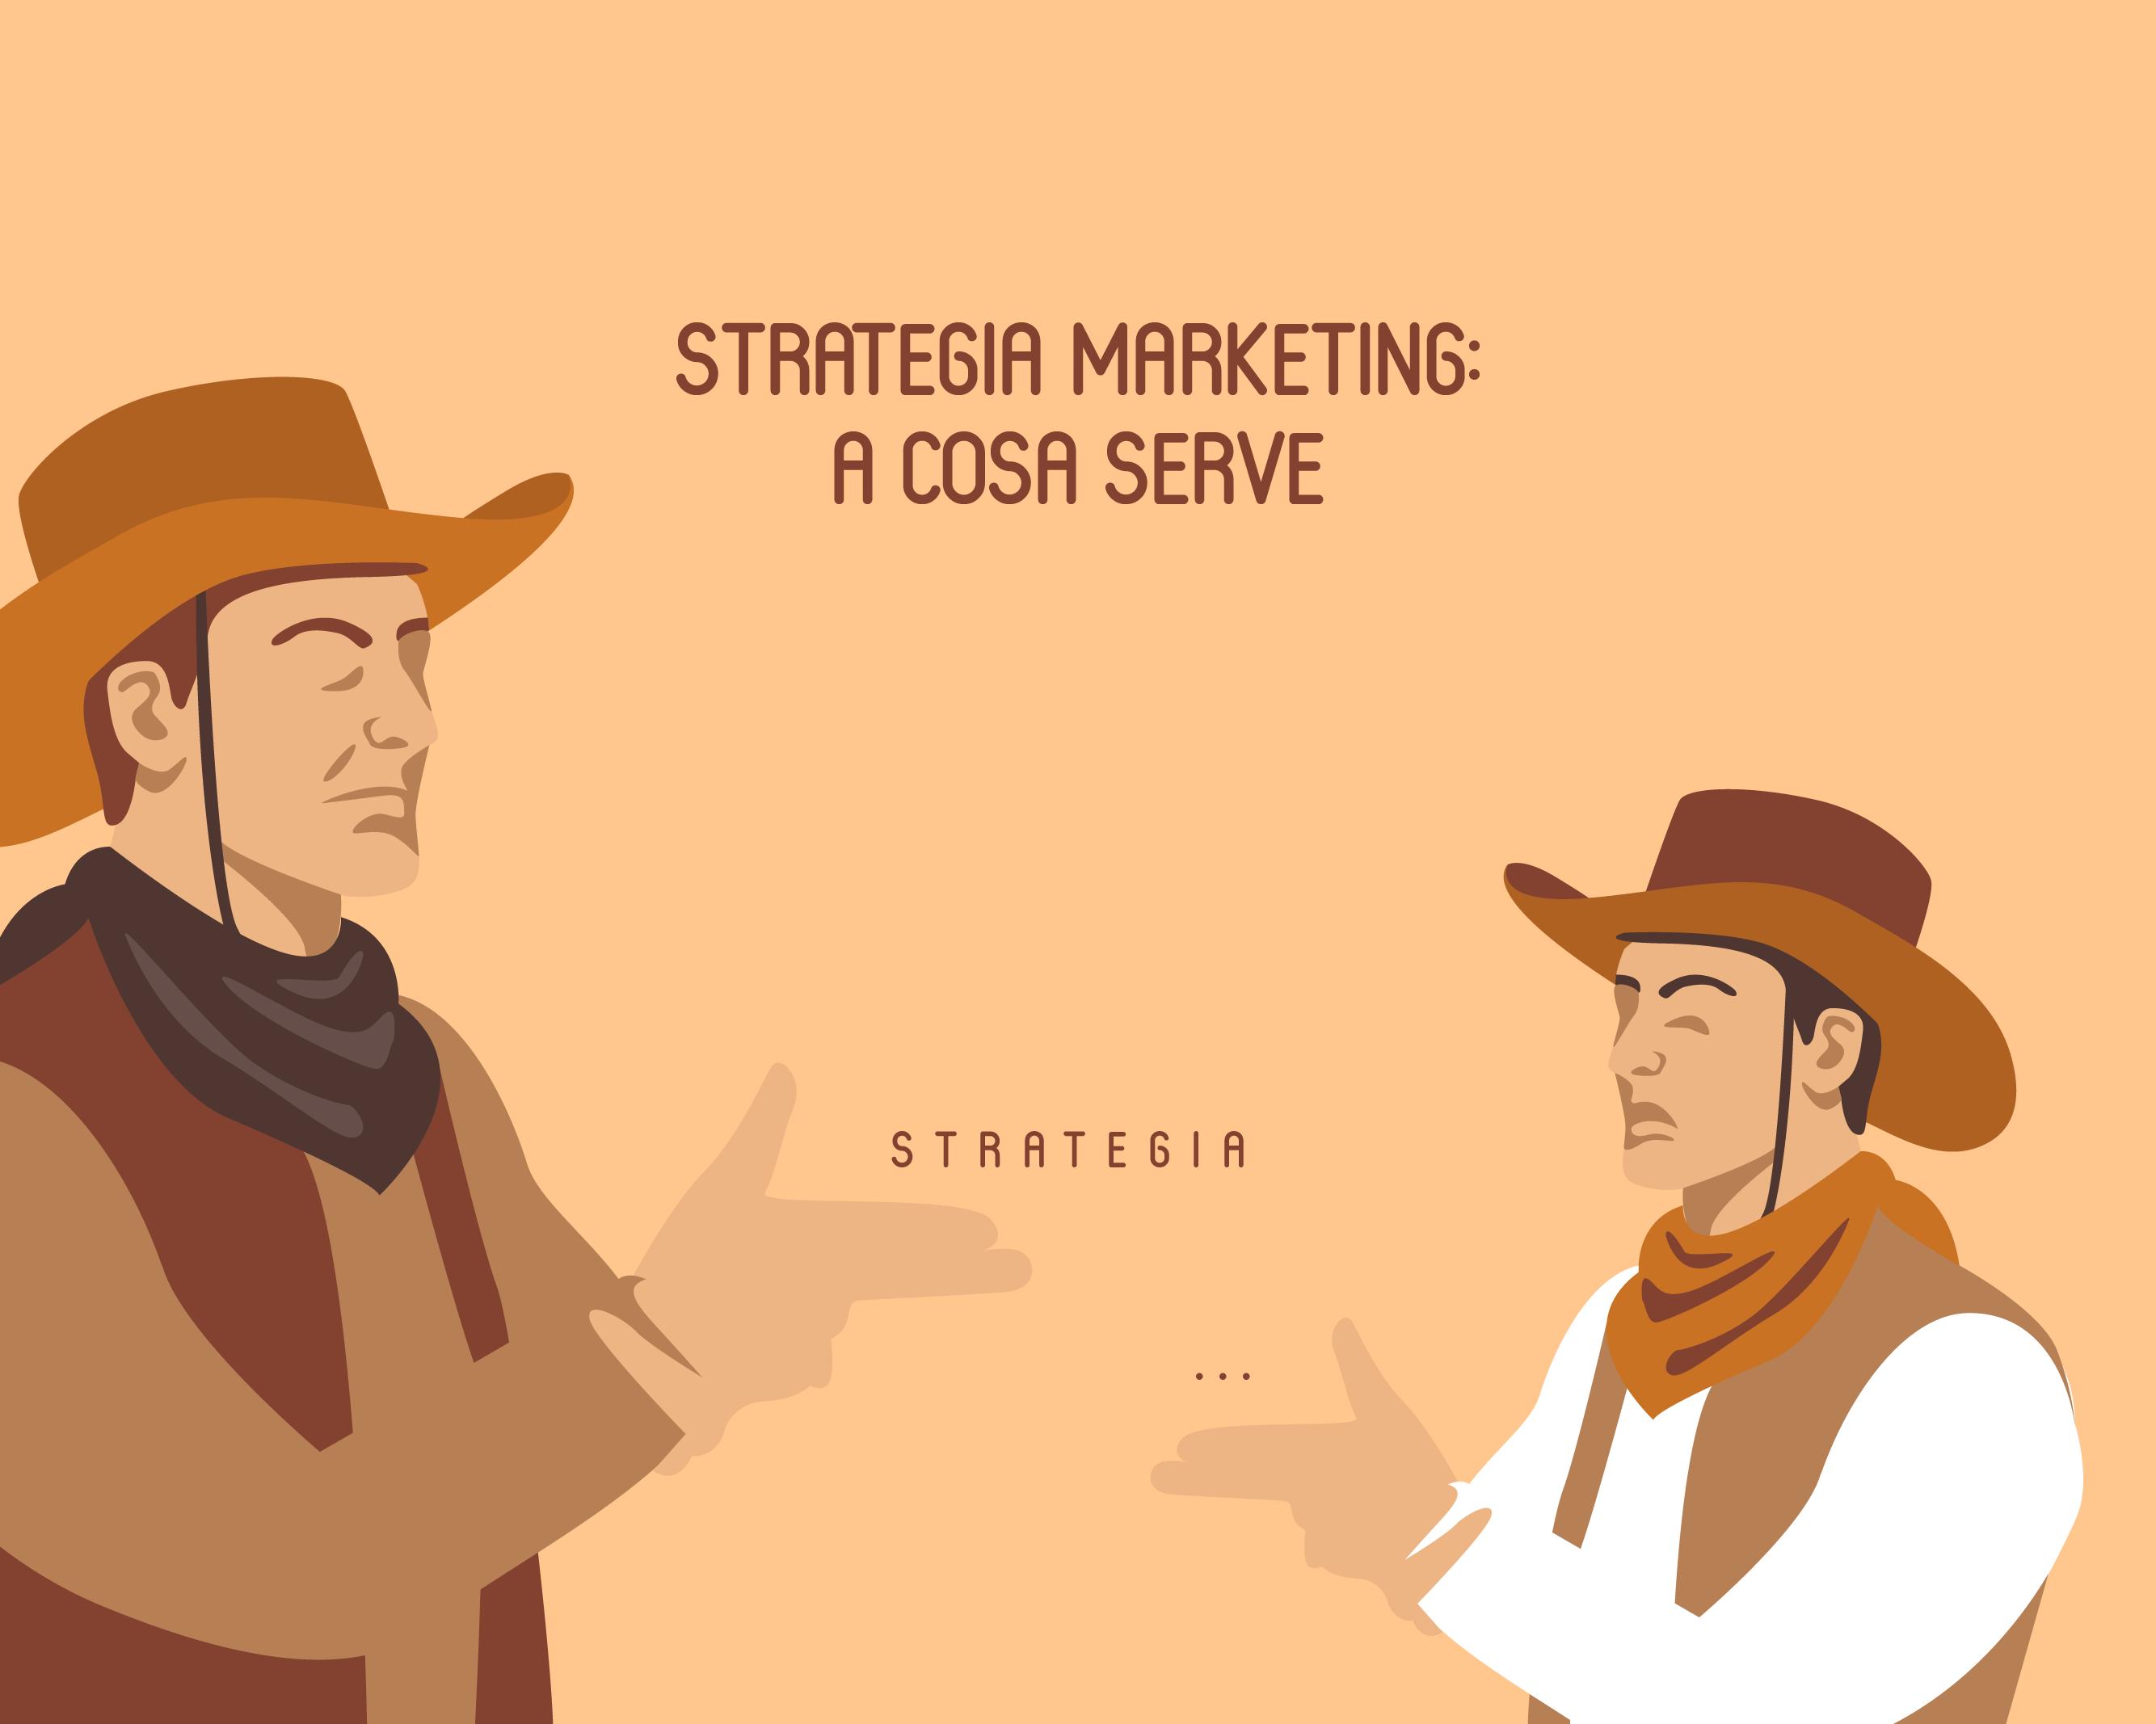 Strategia marketing: a cosa serve